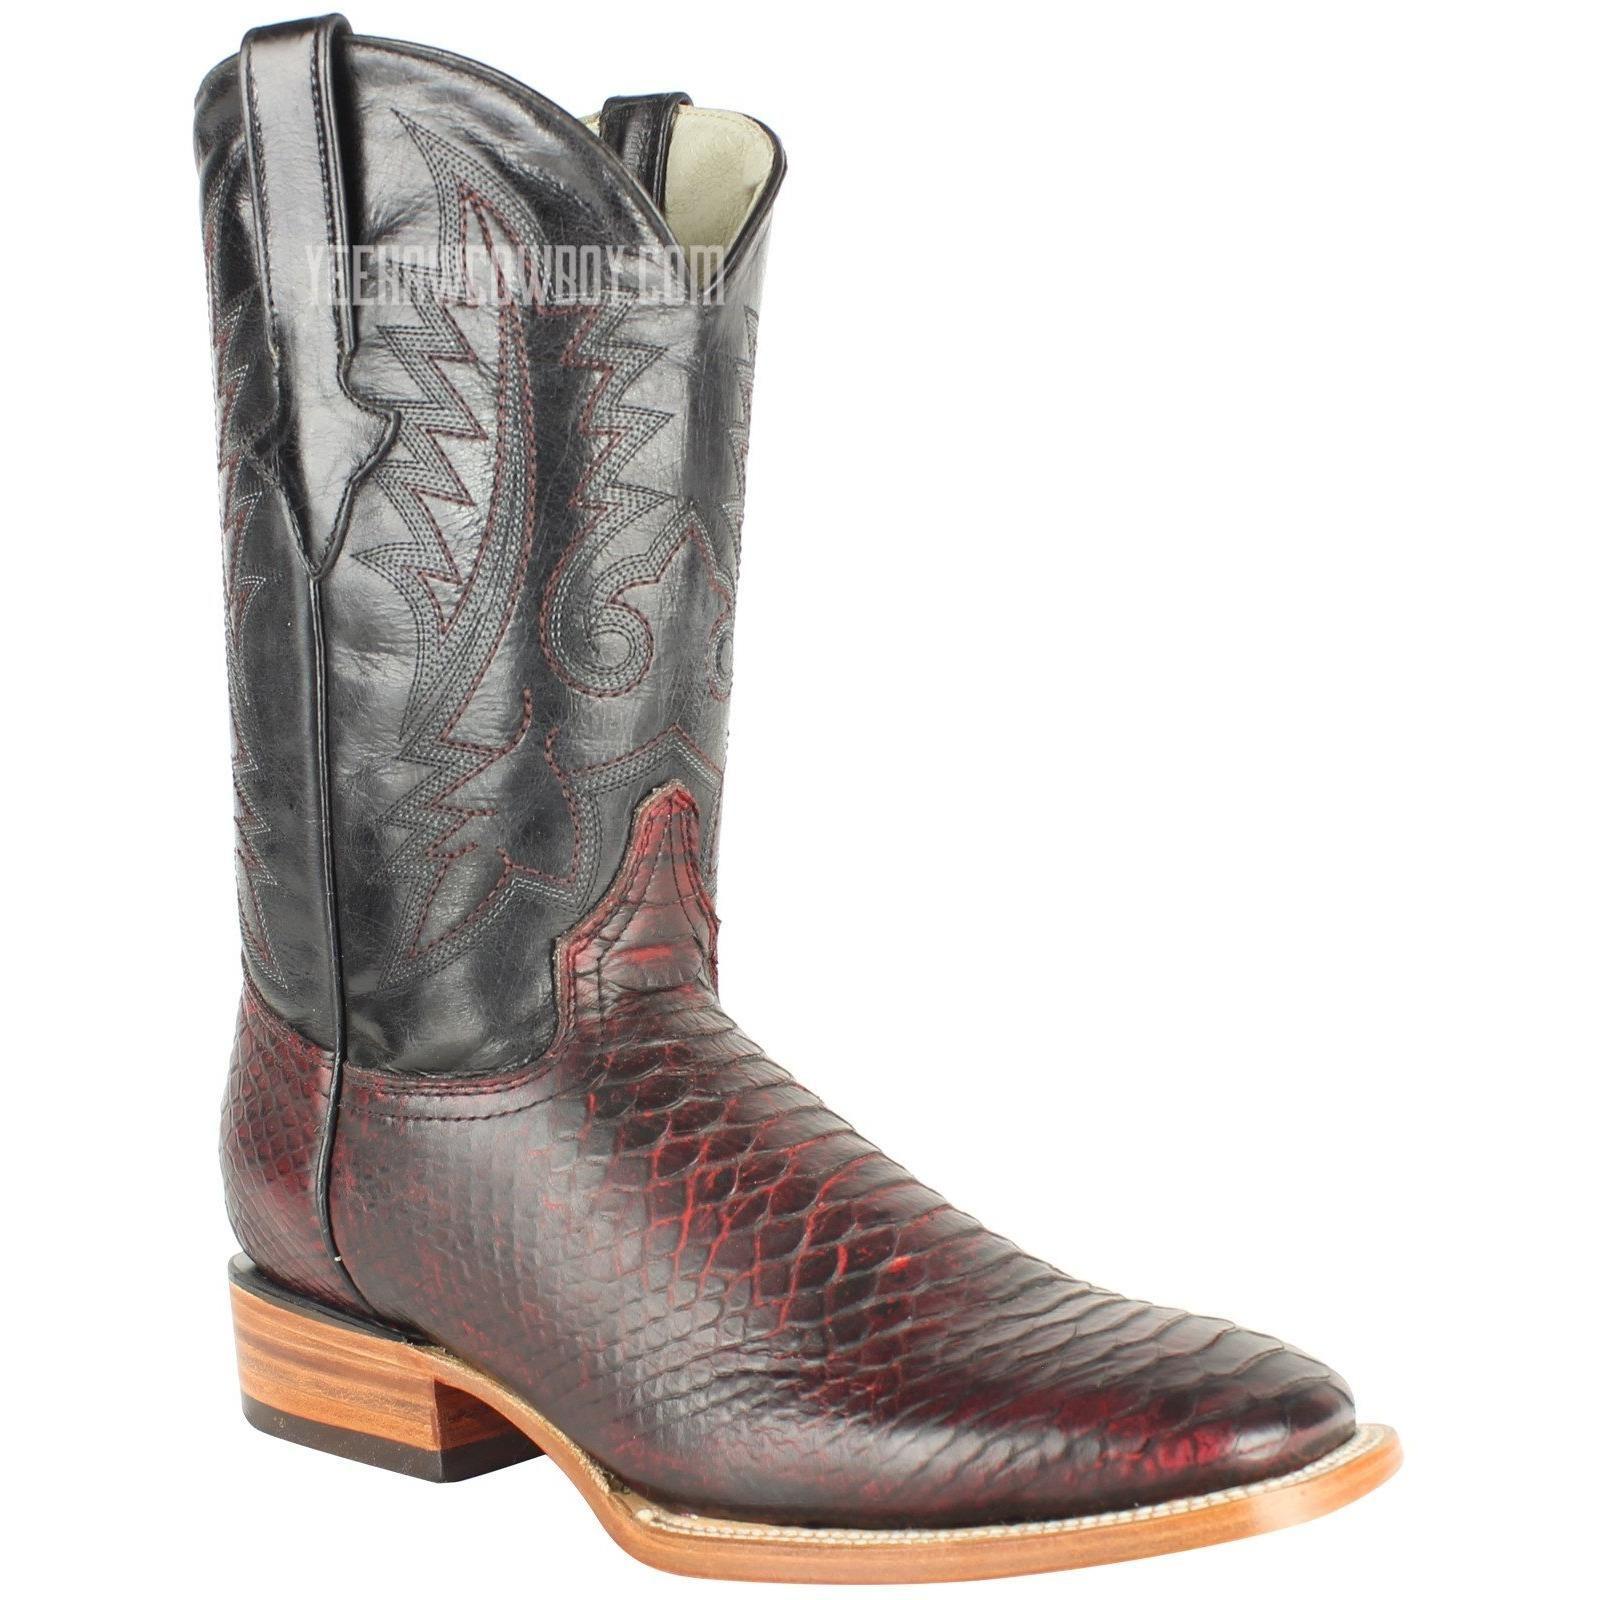 e8b163d0522 Men's Quincy Python Print Boots Square Toe Handcrafted   Cowboy ...